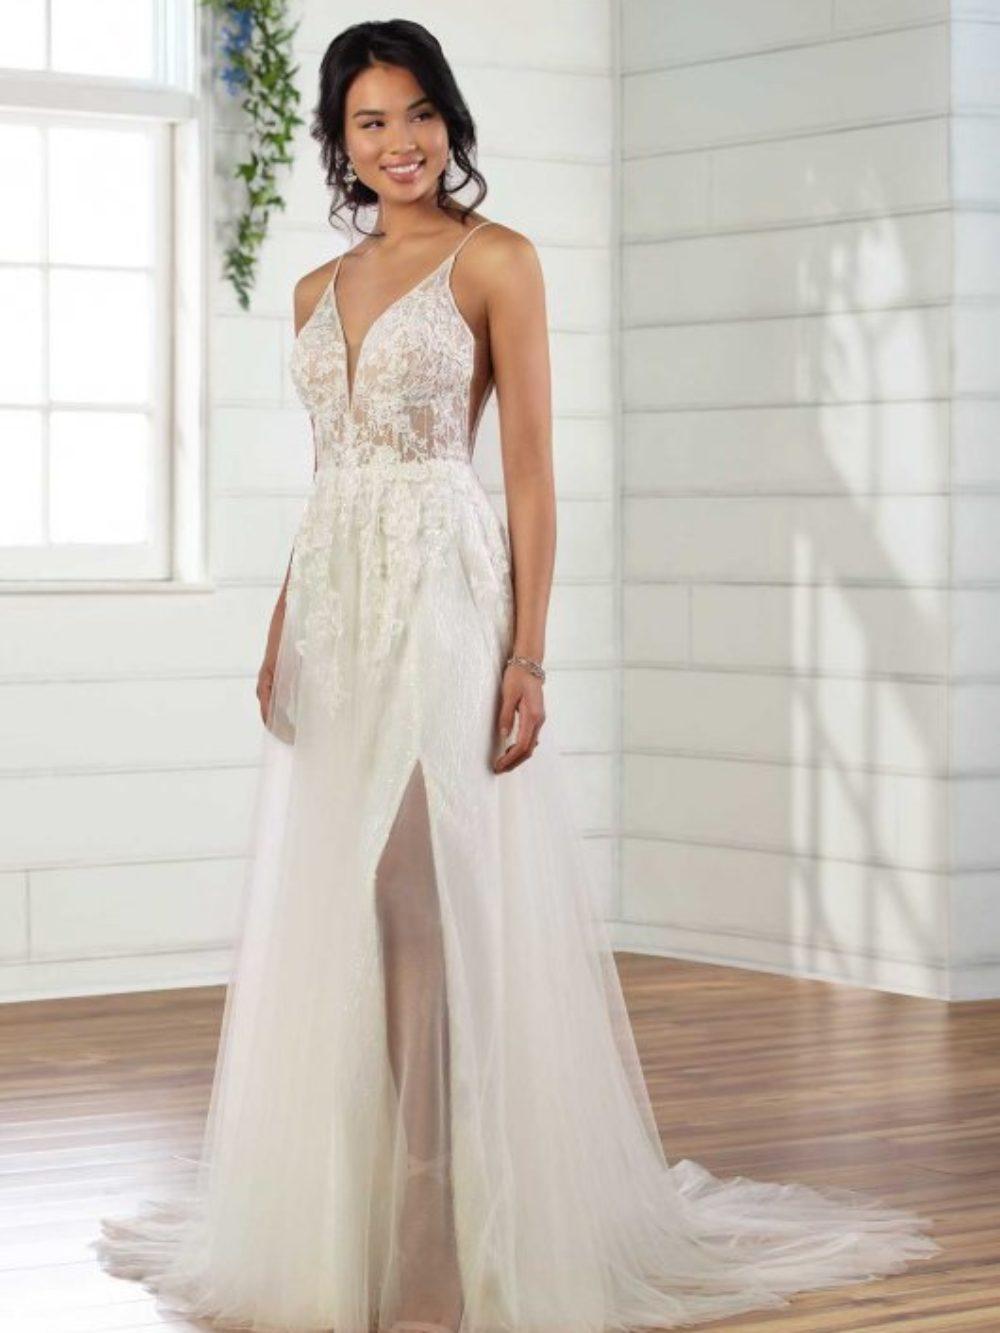 Essense Of Australia Wedding Dresses At Precious Memories Malden Ma